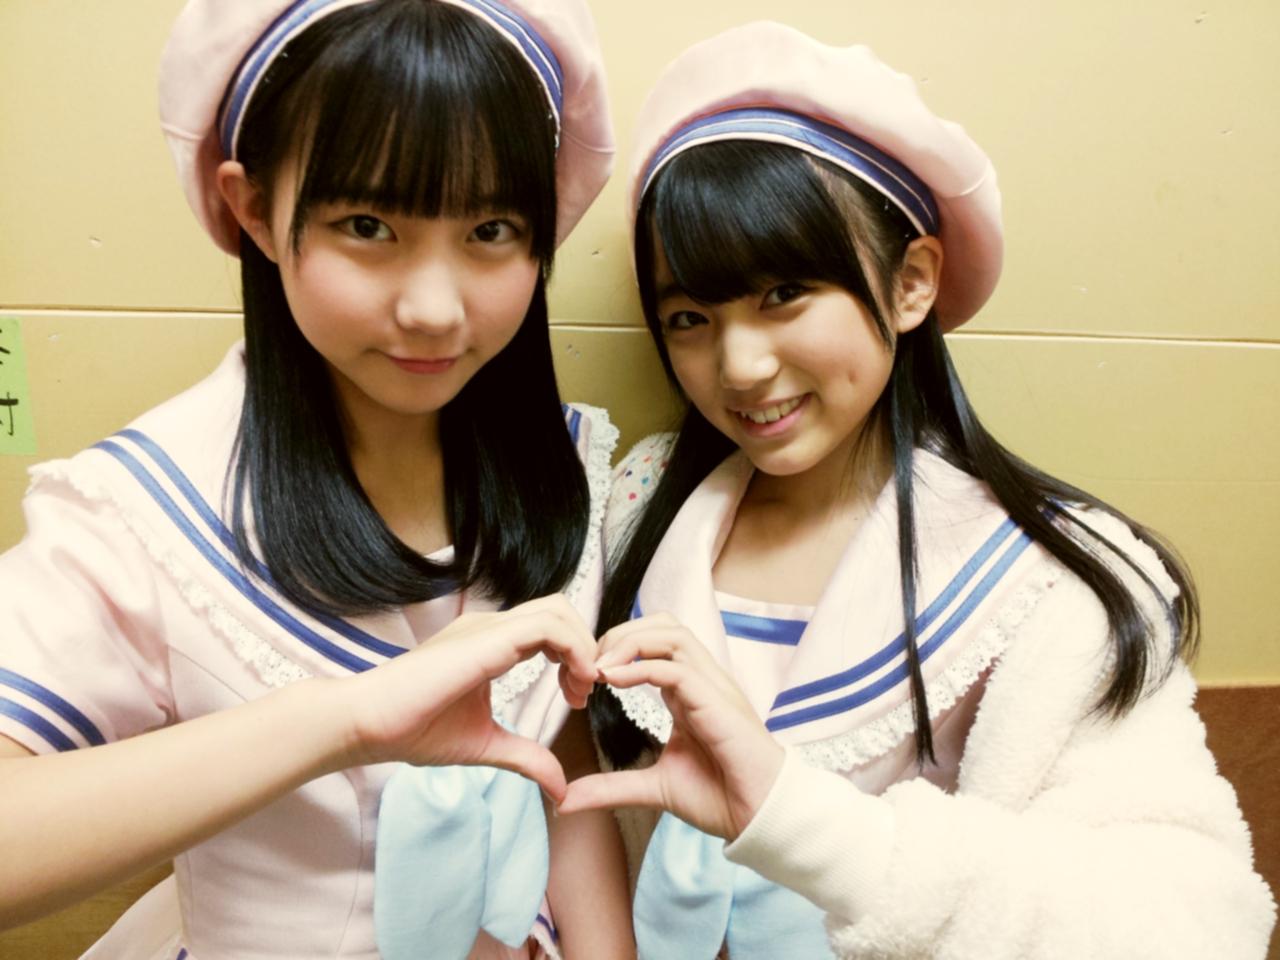 【HKT48】田中美久ちゃん応援スレ☆2【みくりん】YouTube動画>6本 ->画像>238枚